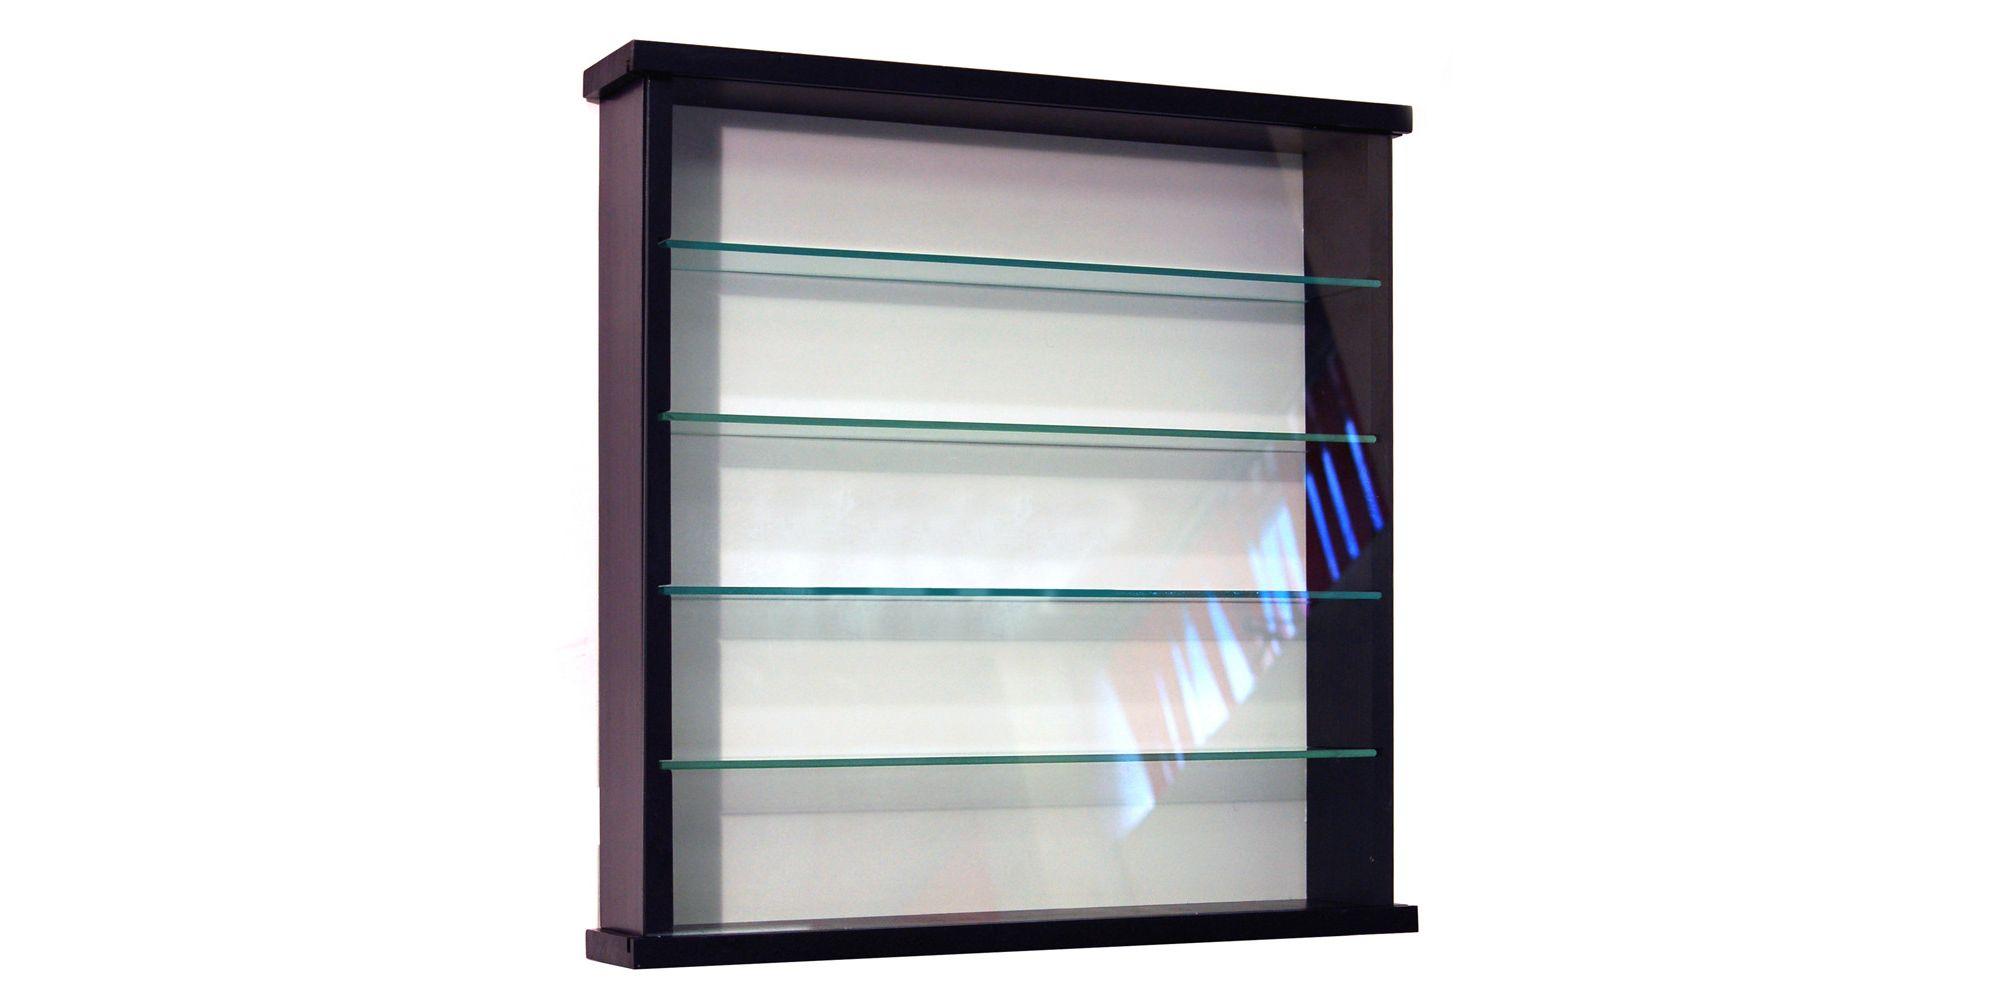 Display Cabinets : 367 0066PI1000015MNwid2000amphei2000 from furnituresalestoday.co.uk size 2000 x 2000 jpeg 92kB